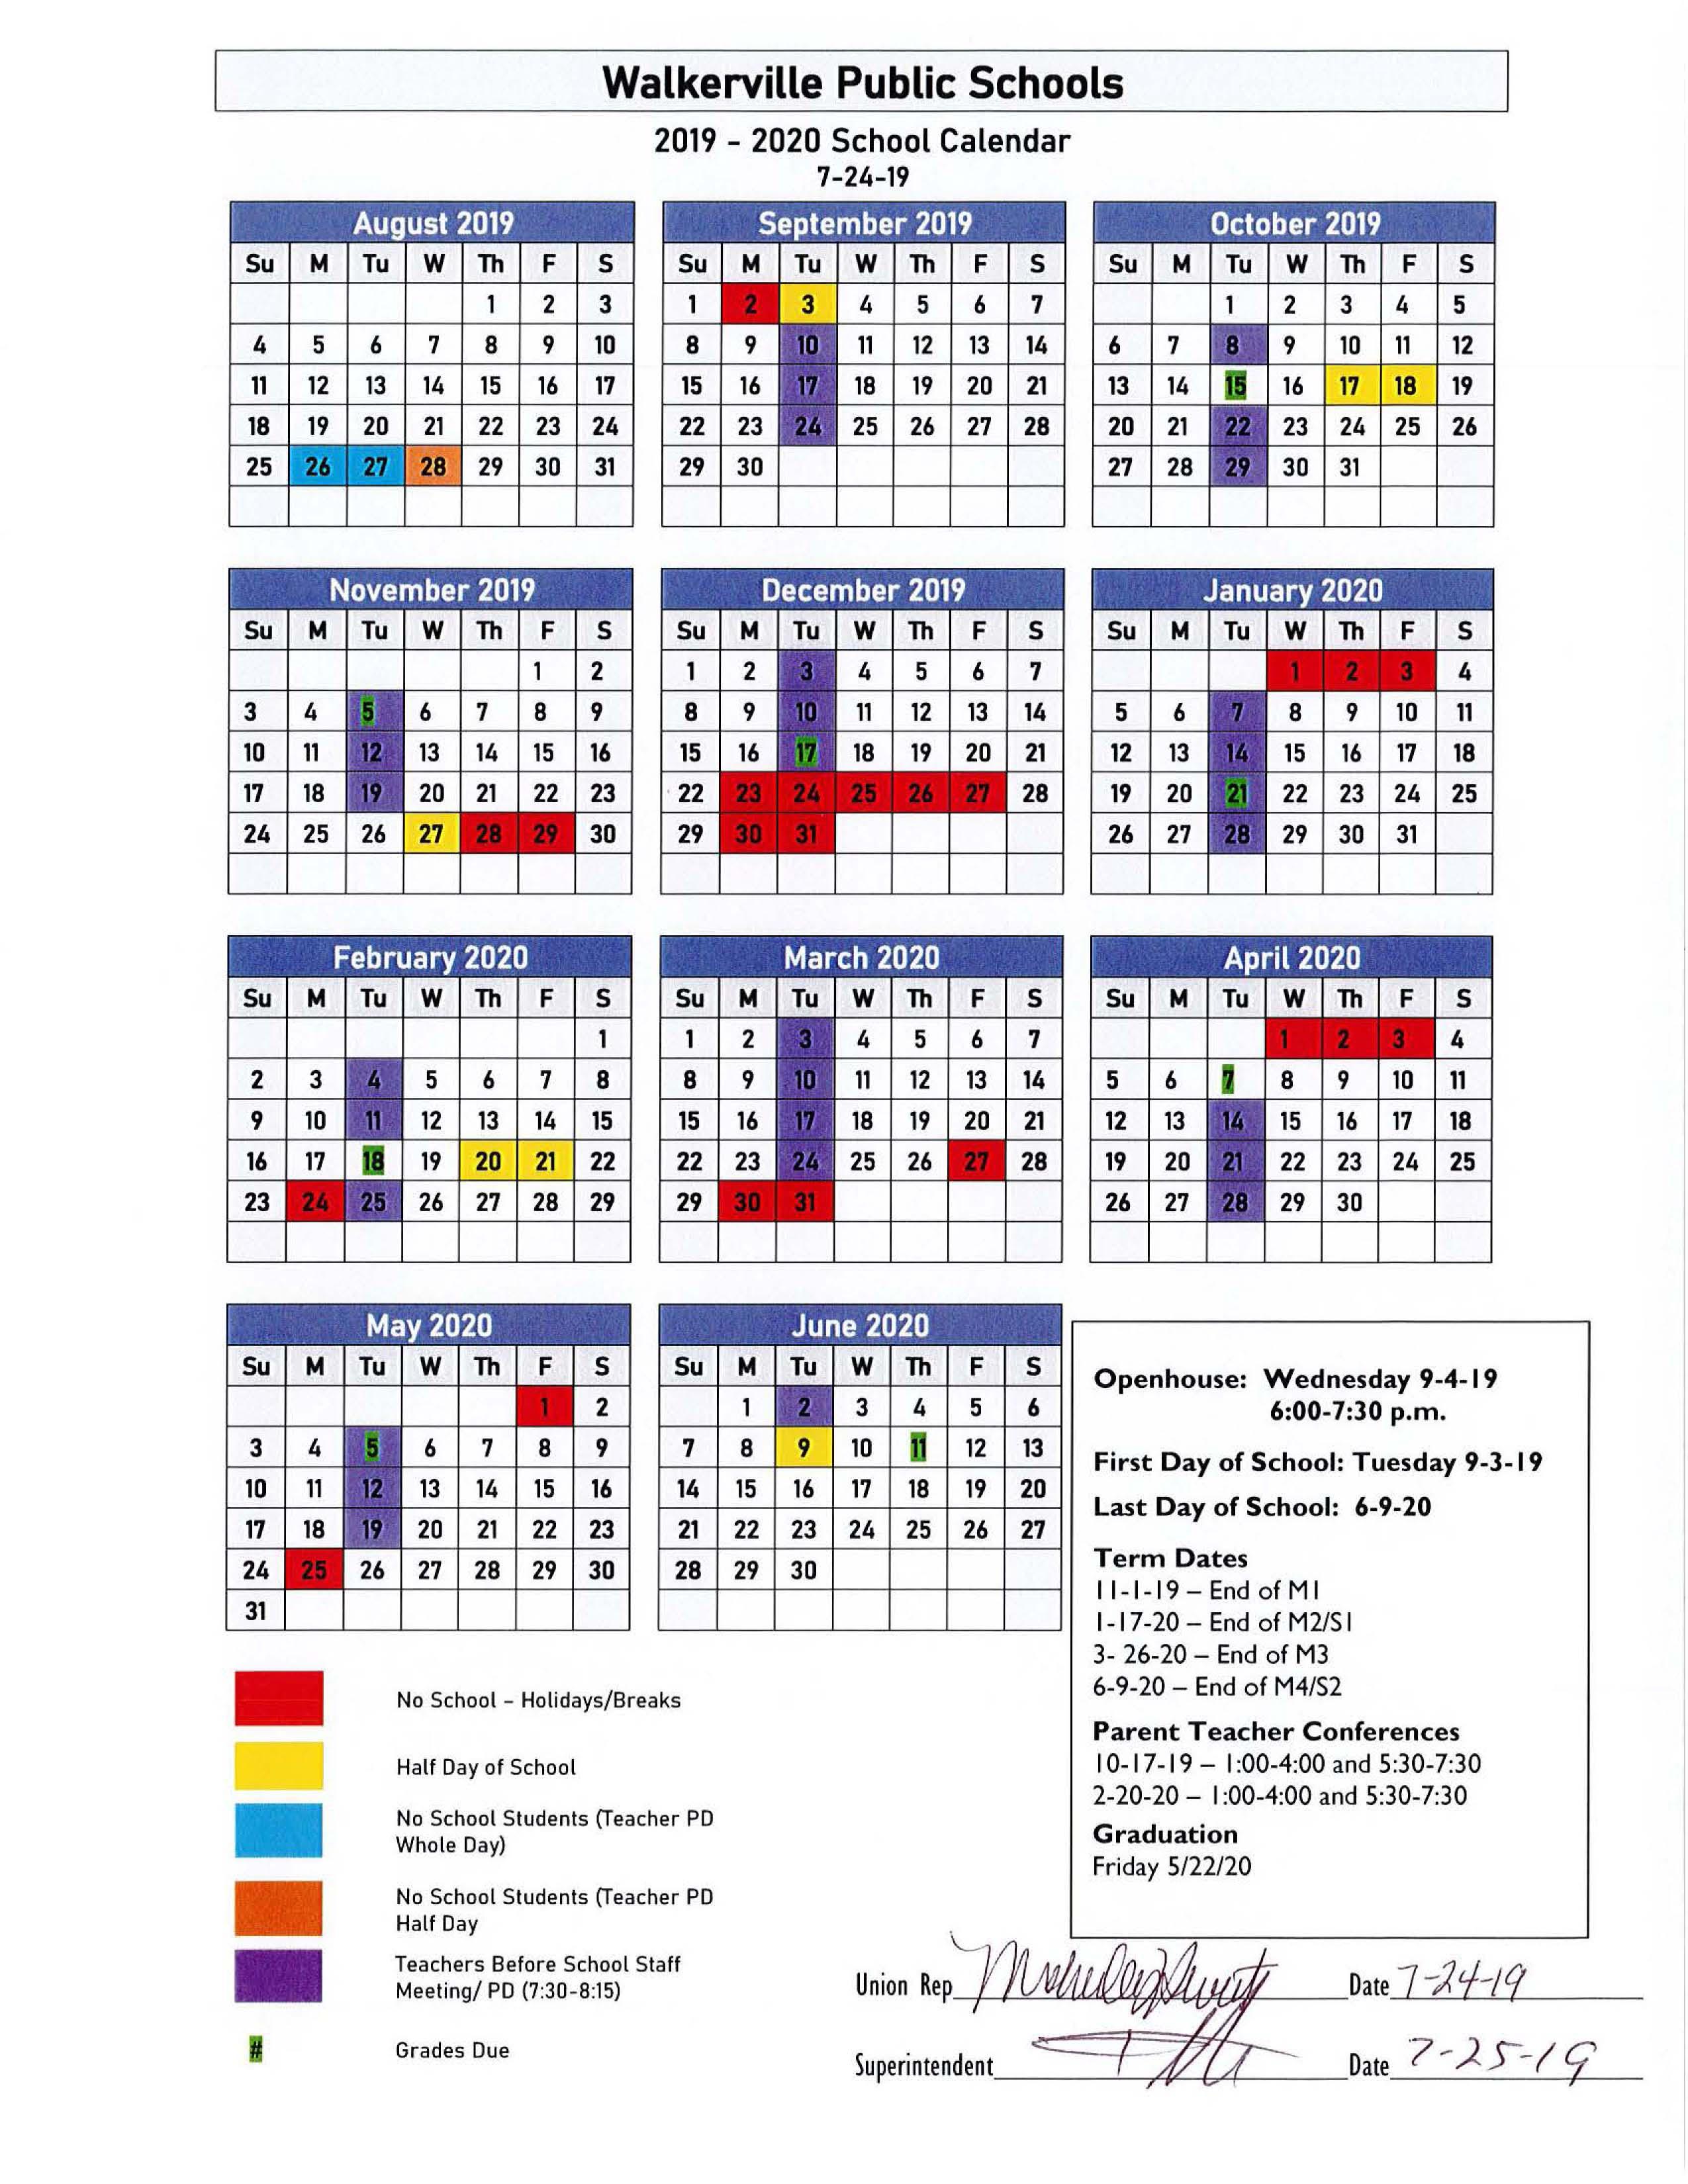 Calendar - Walkerville Wildcats With Grand Haven High School Clendar